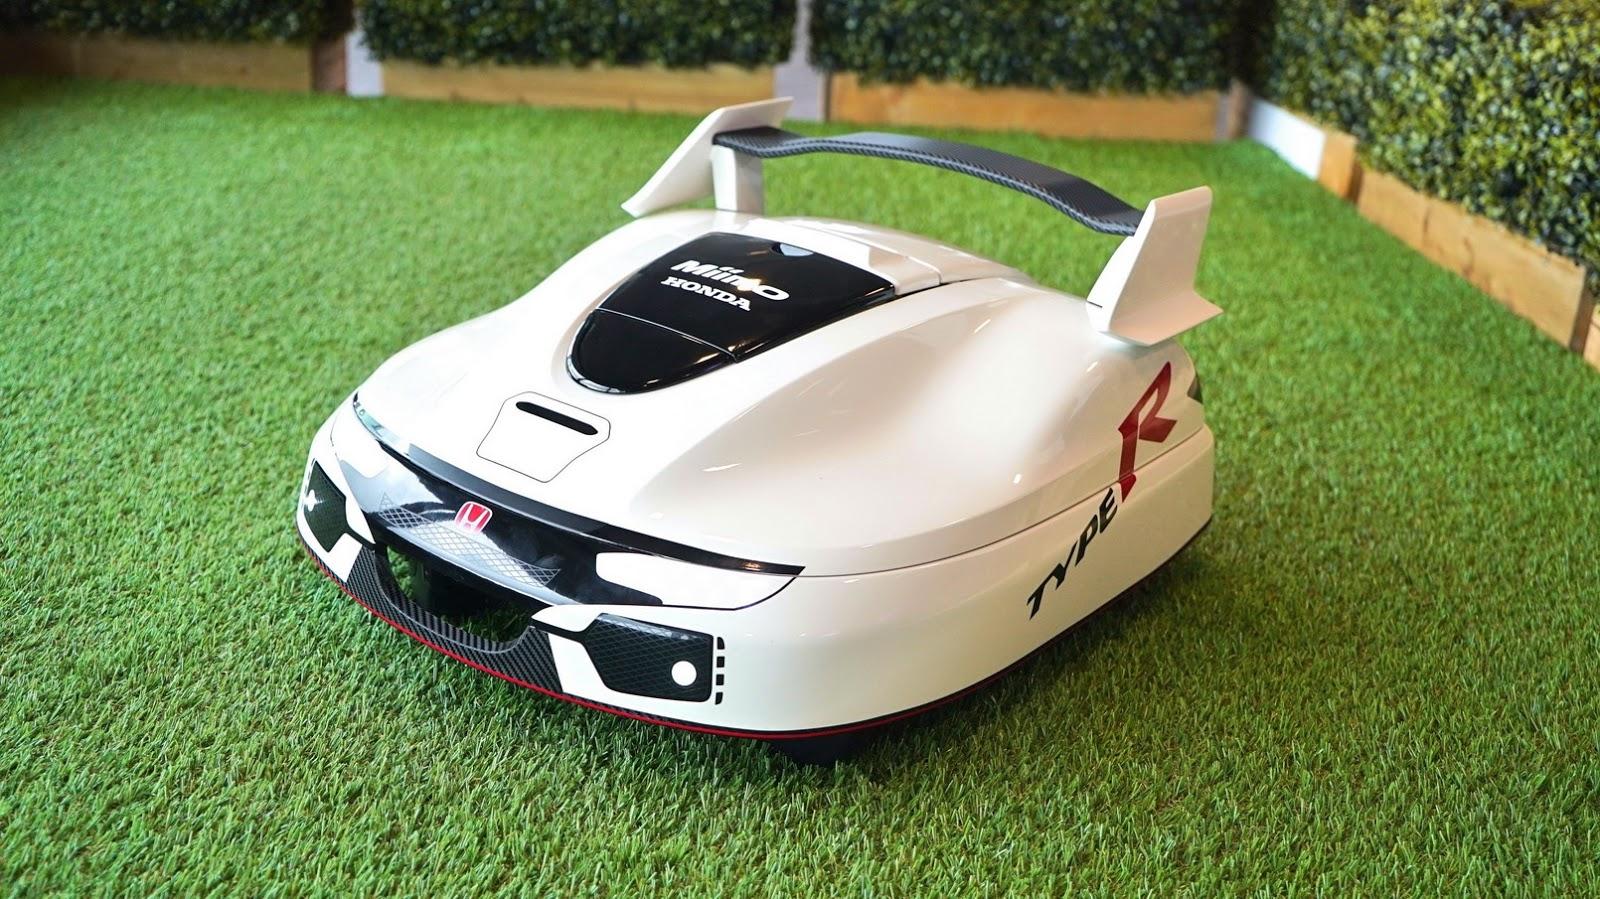 Honda-Robo-Mower-11